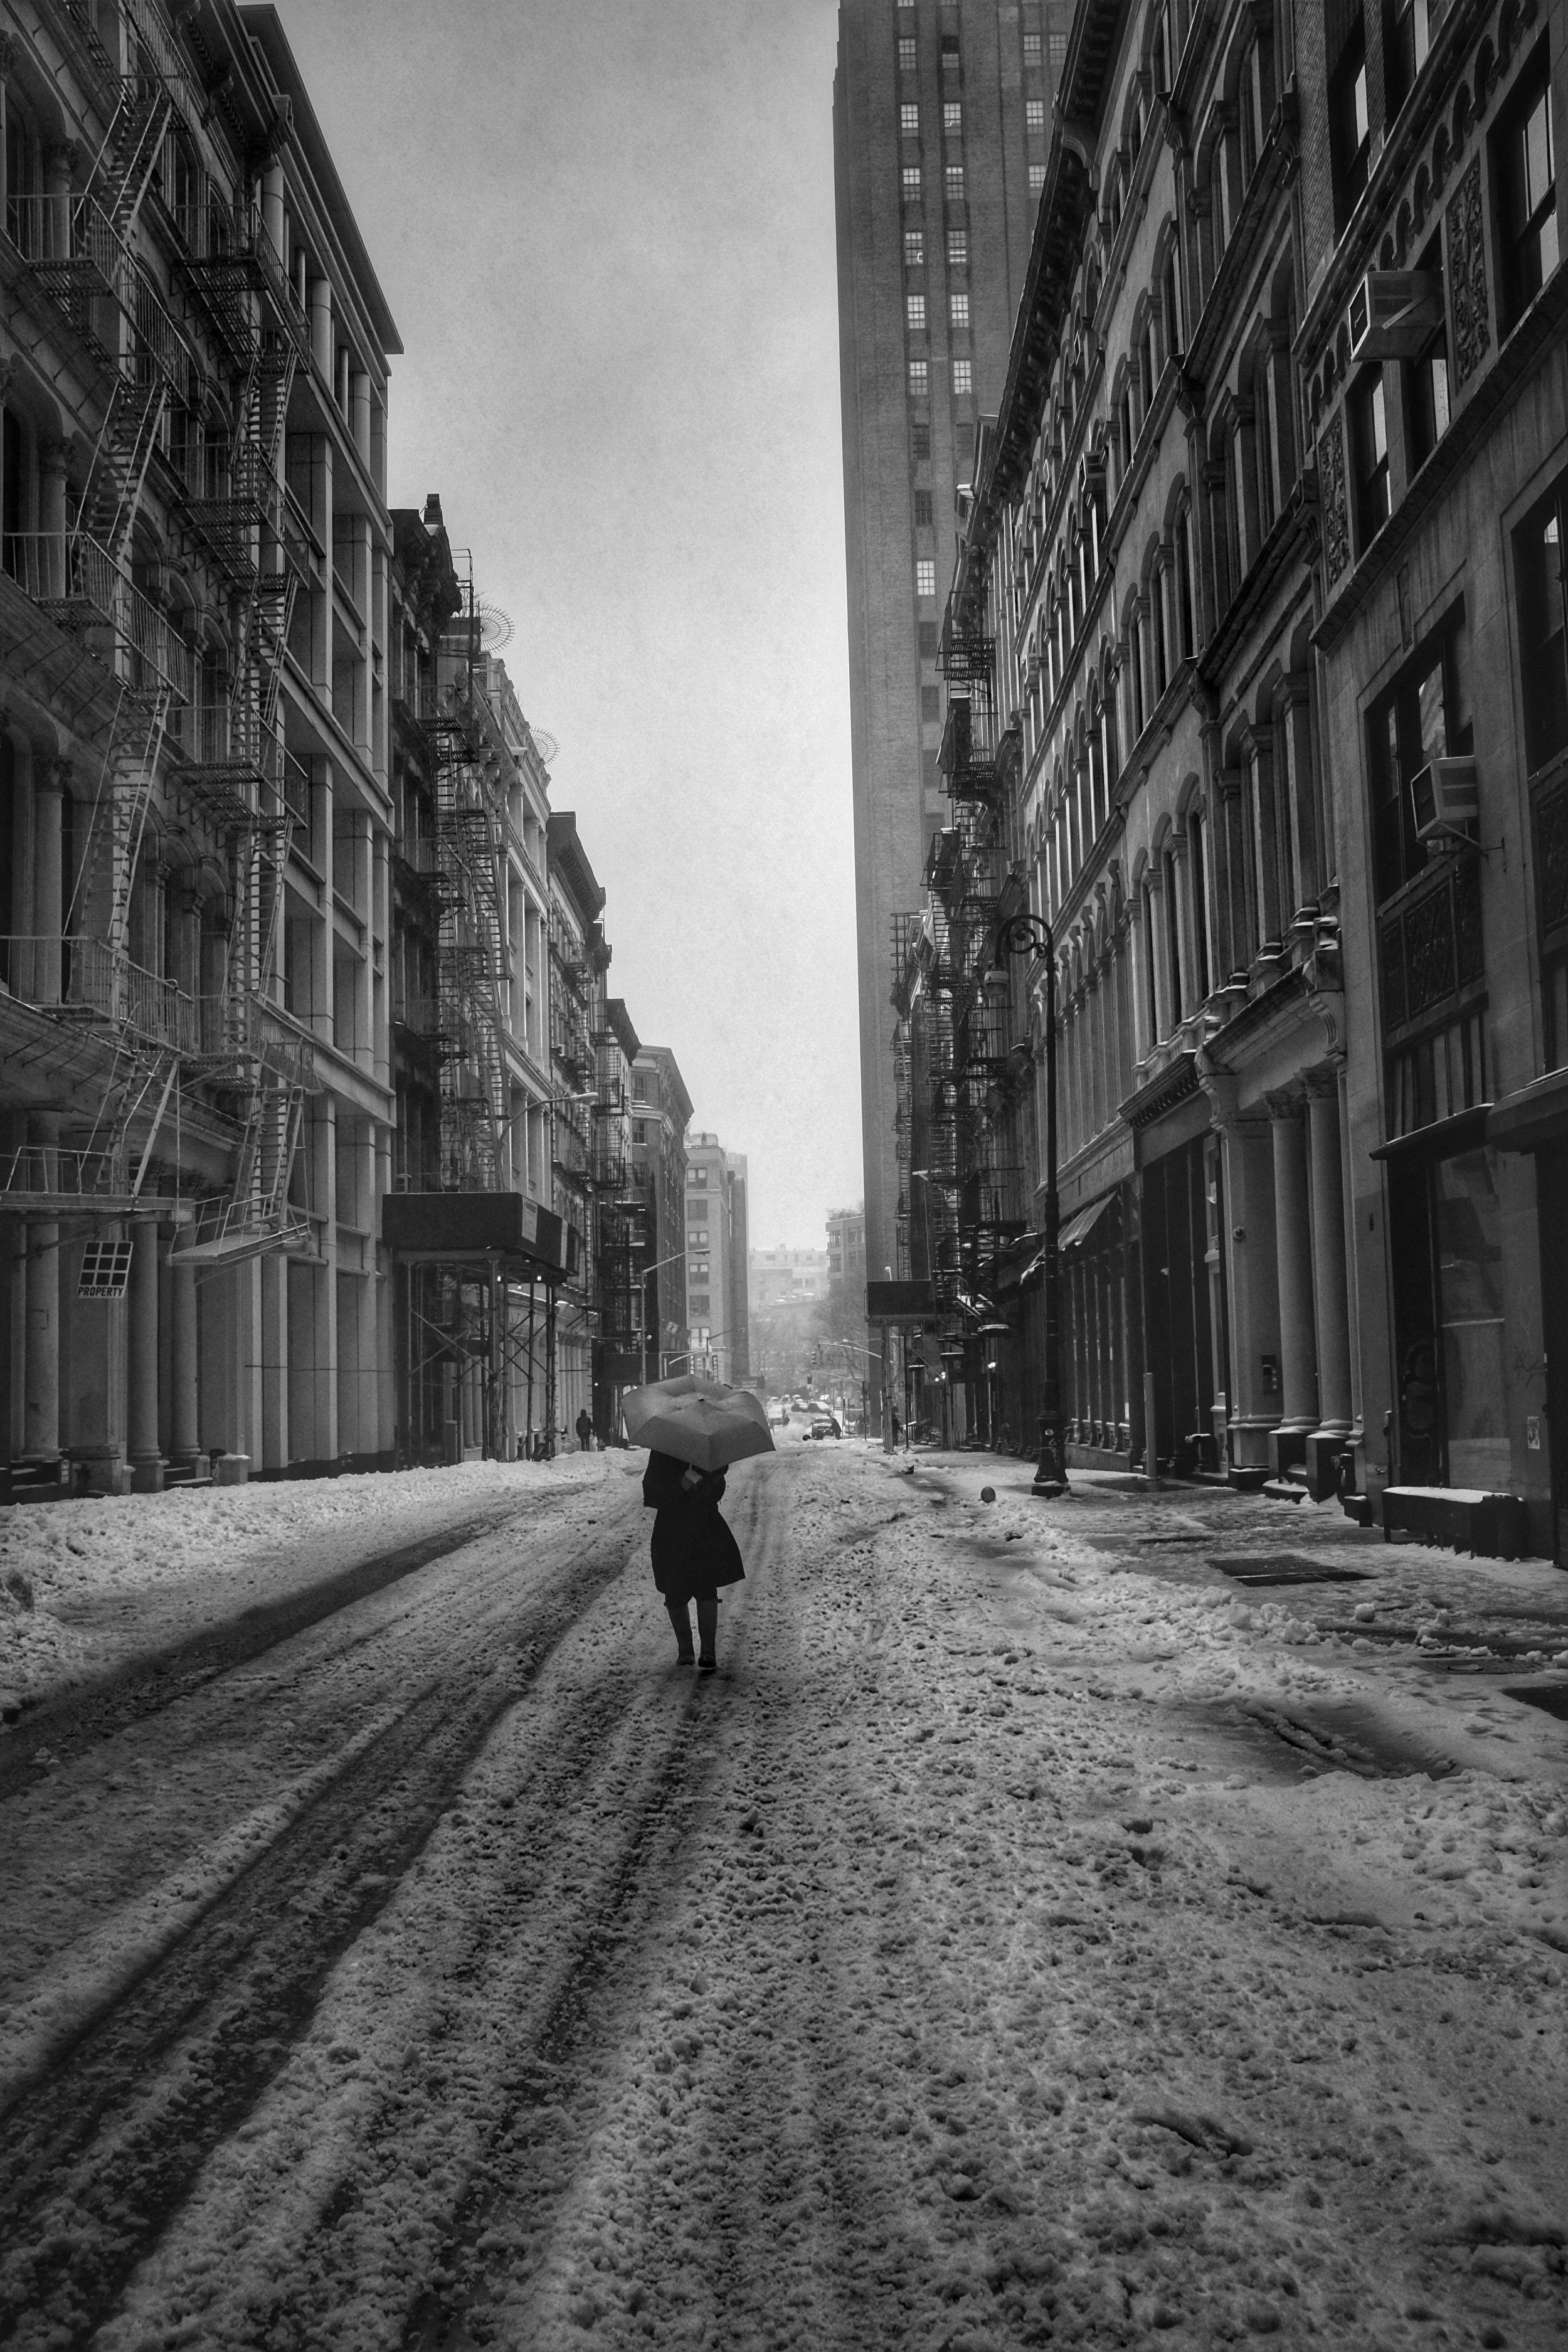 Walker Street. TriBeCa. New York City. 2017